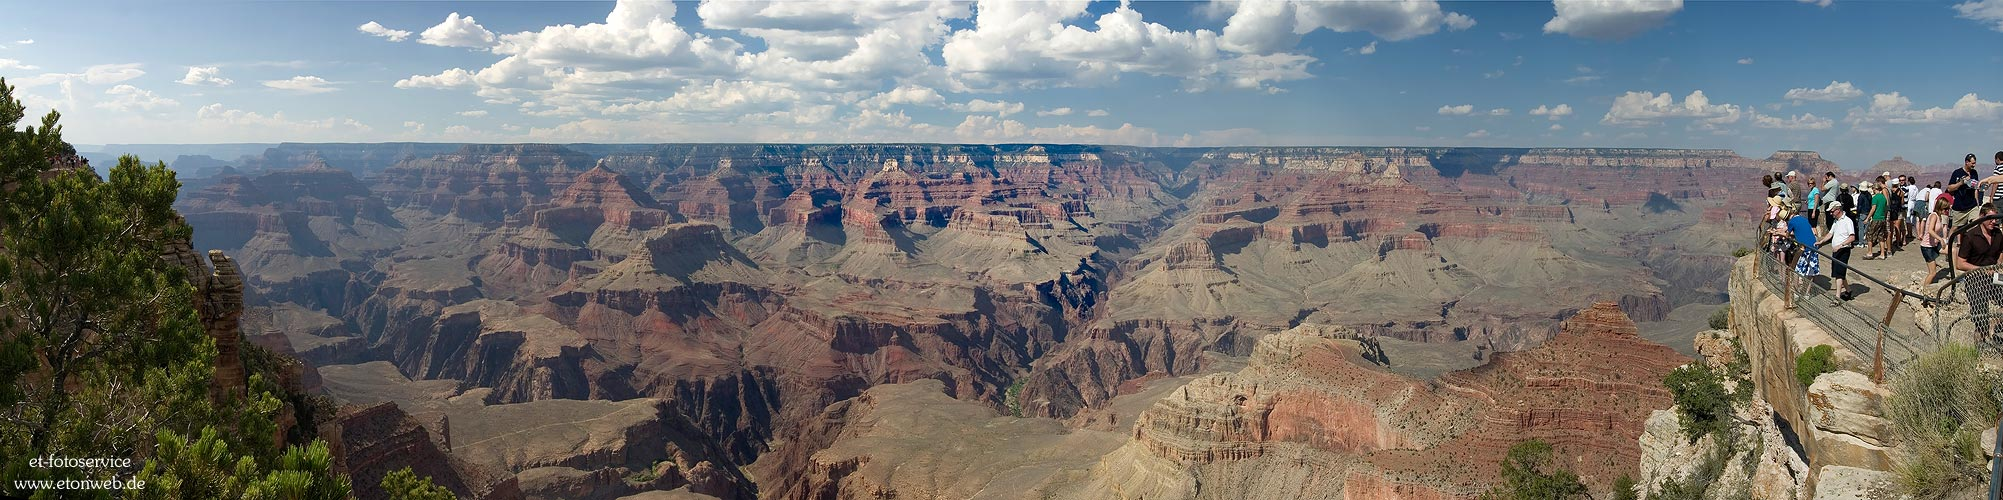 Grand Canyon - Blick vom South Rim